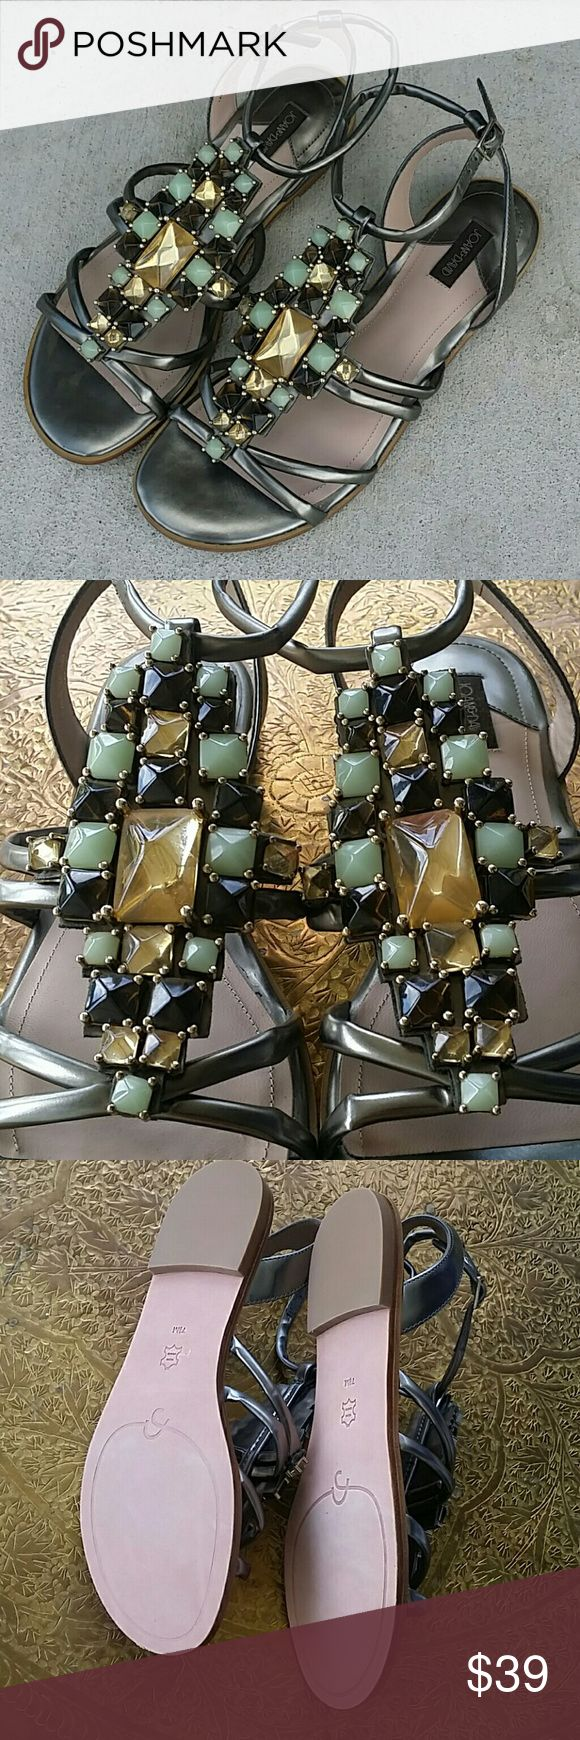 Joan & David Kadison Sandals Size 7 NEVER WORN  Madison jeweled sandals Beautiful topaz and jade colored stones on a gunmetal silver gladiator style sandal. Joan & David Shoes Sandals